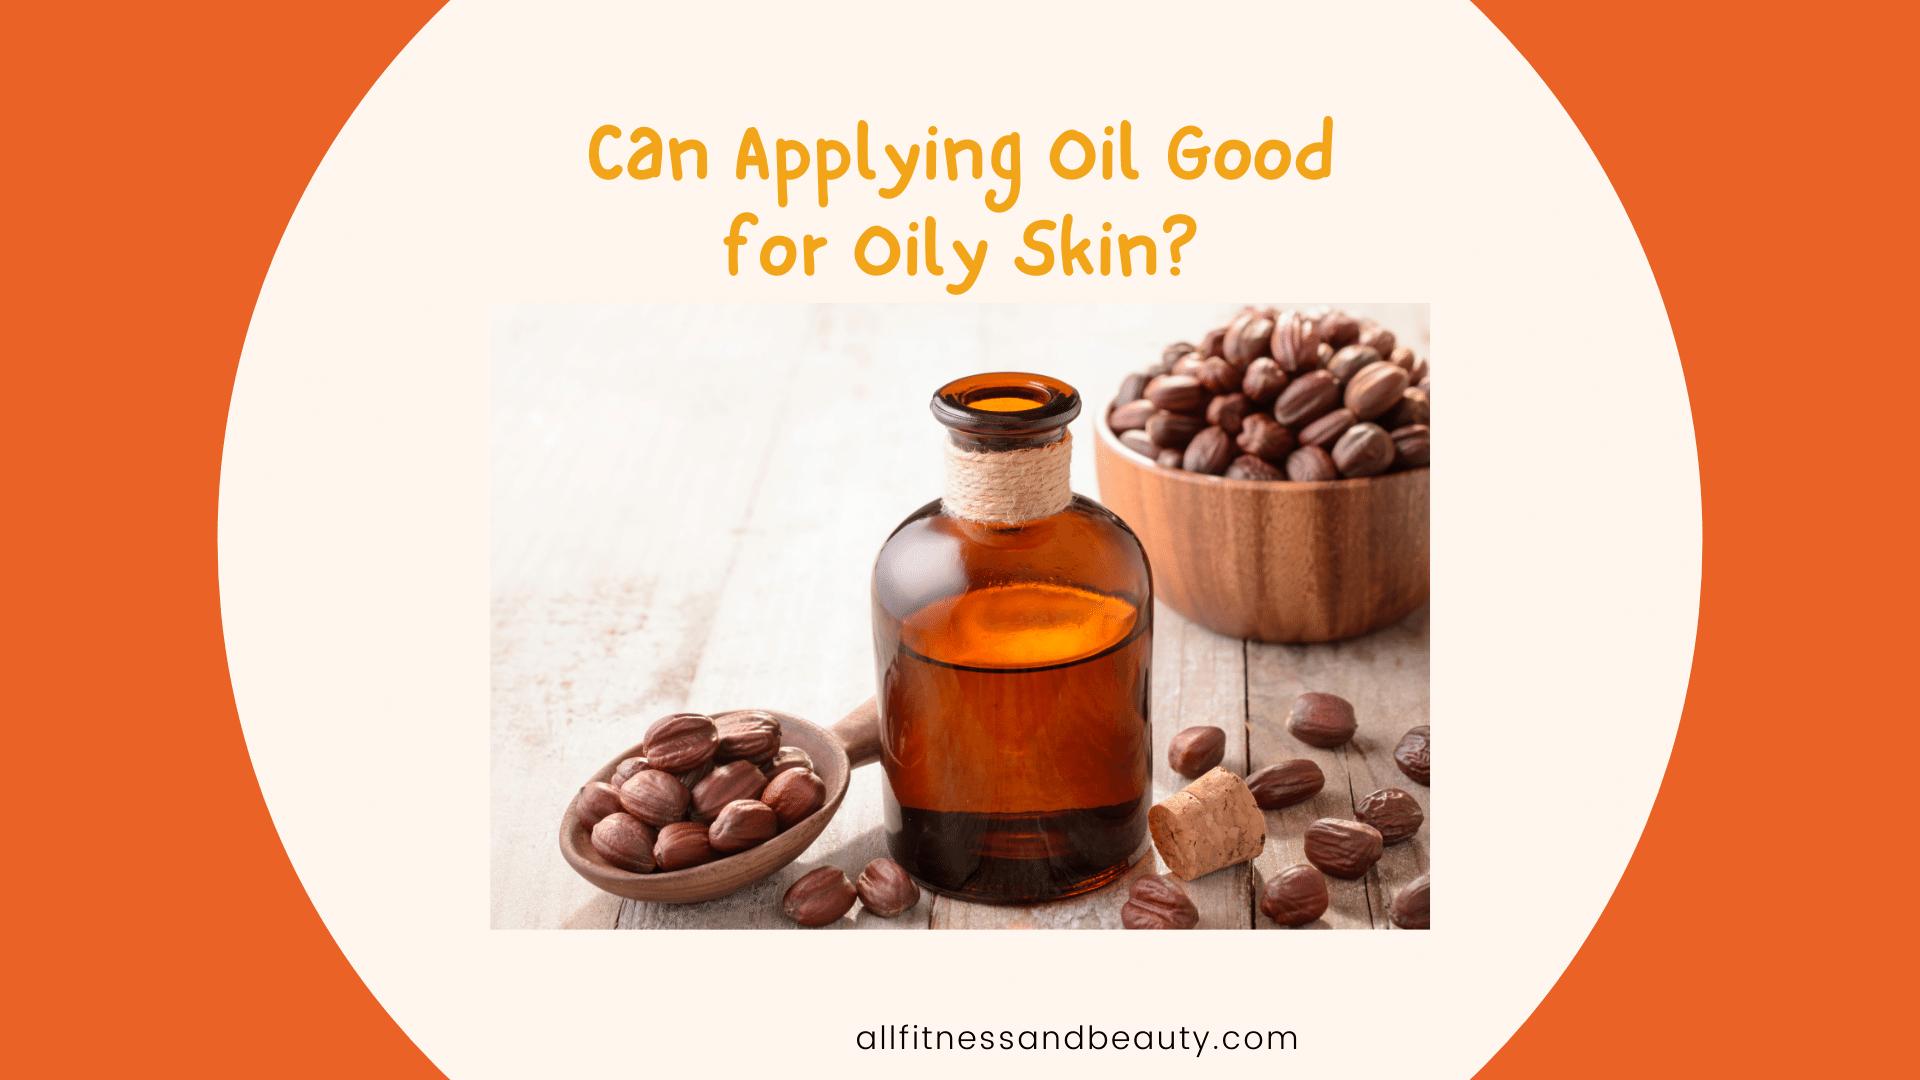 Can Applying Oil Good for Oily Skin